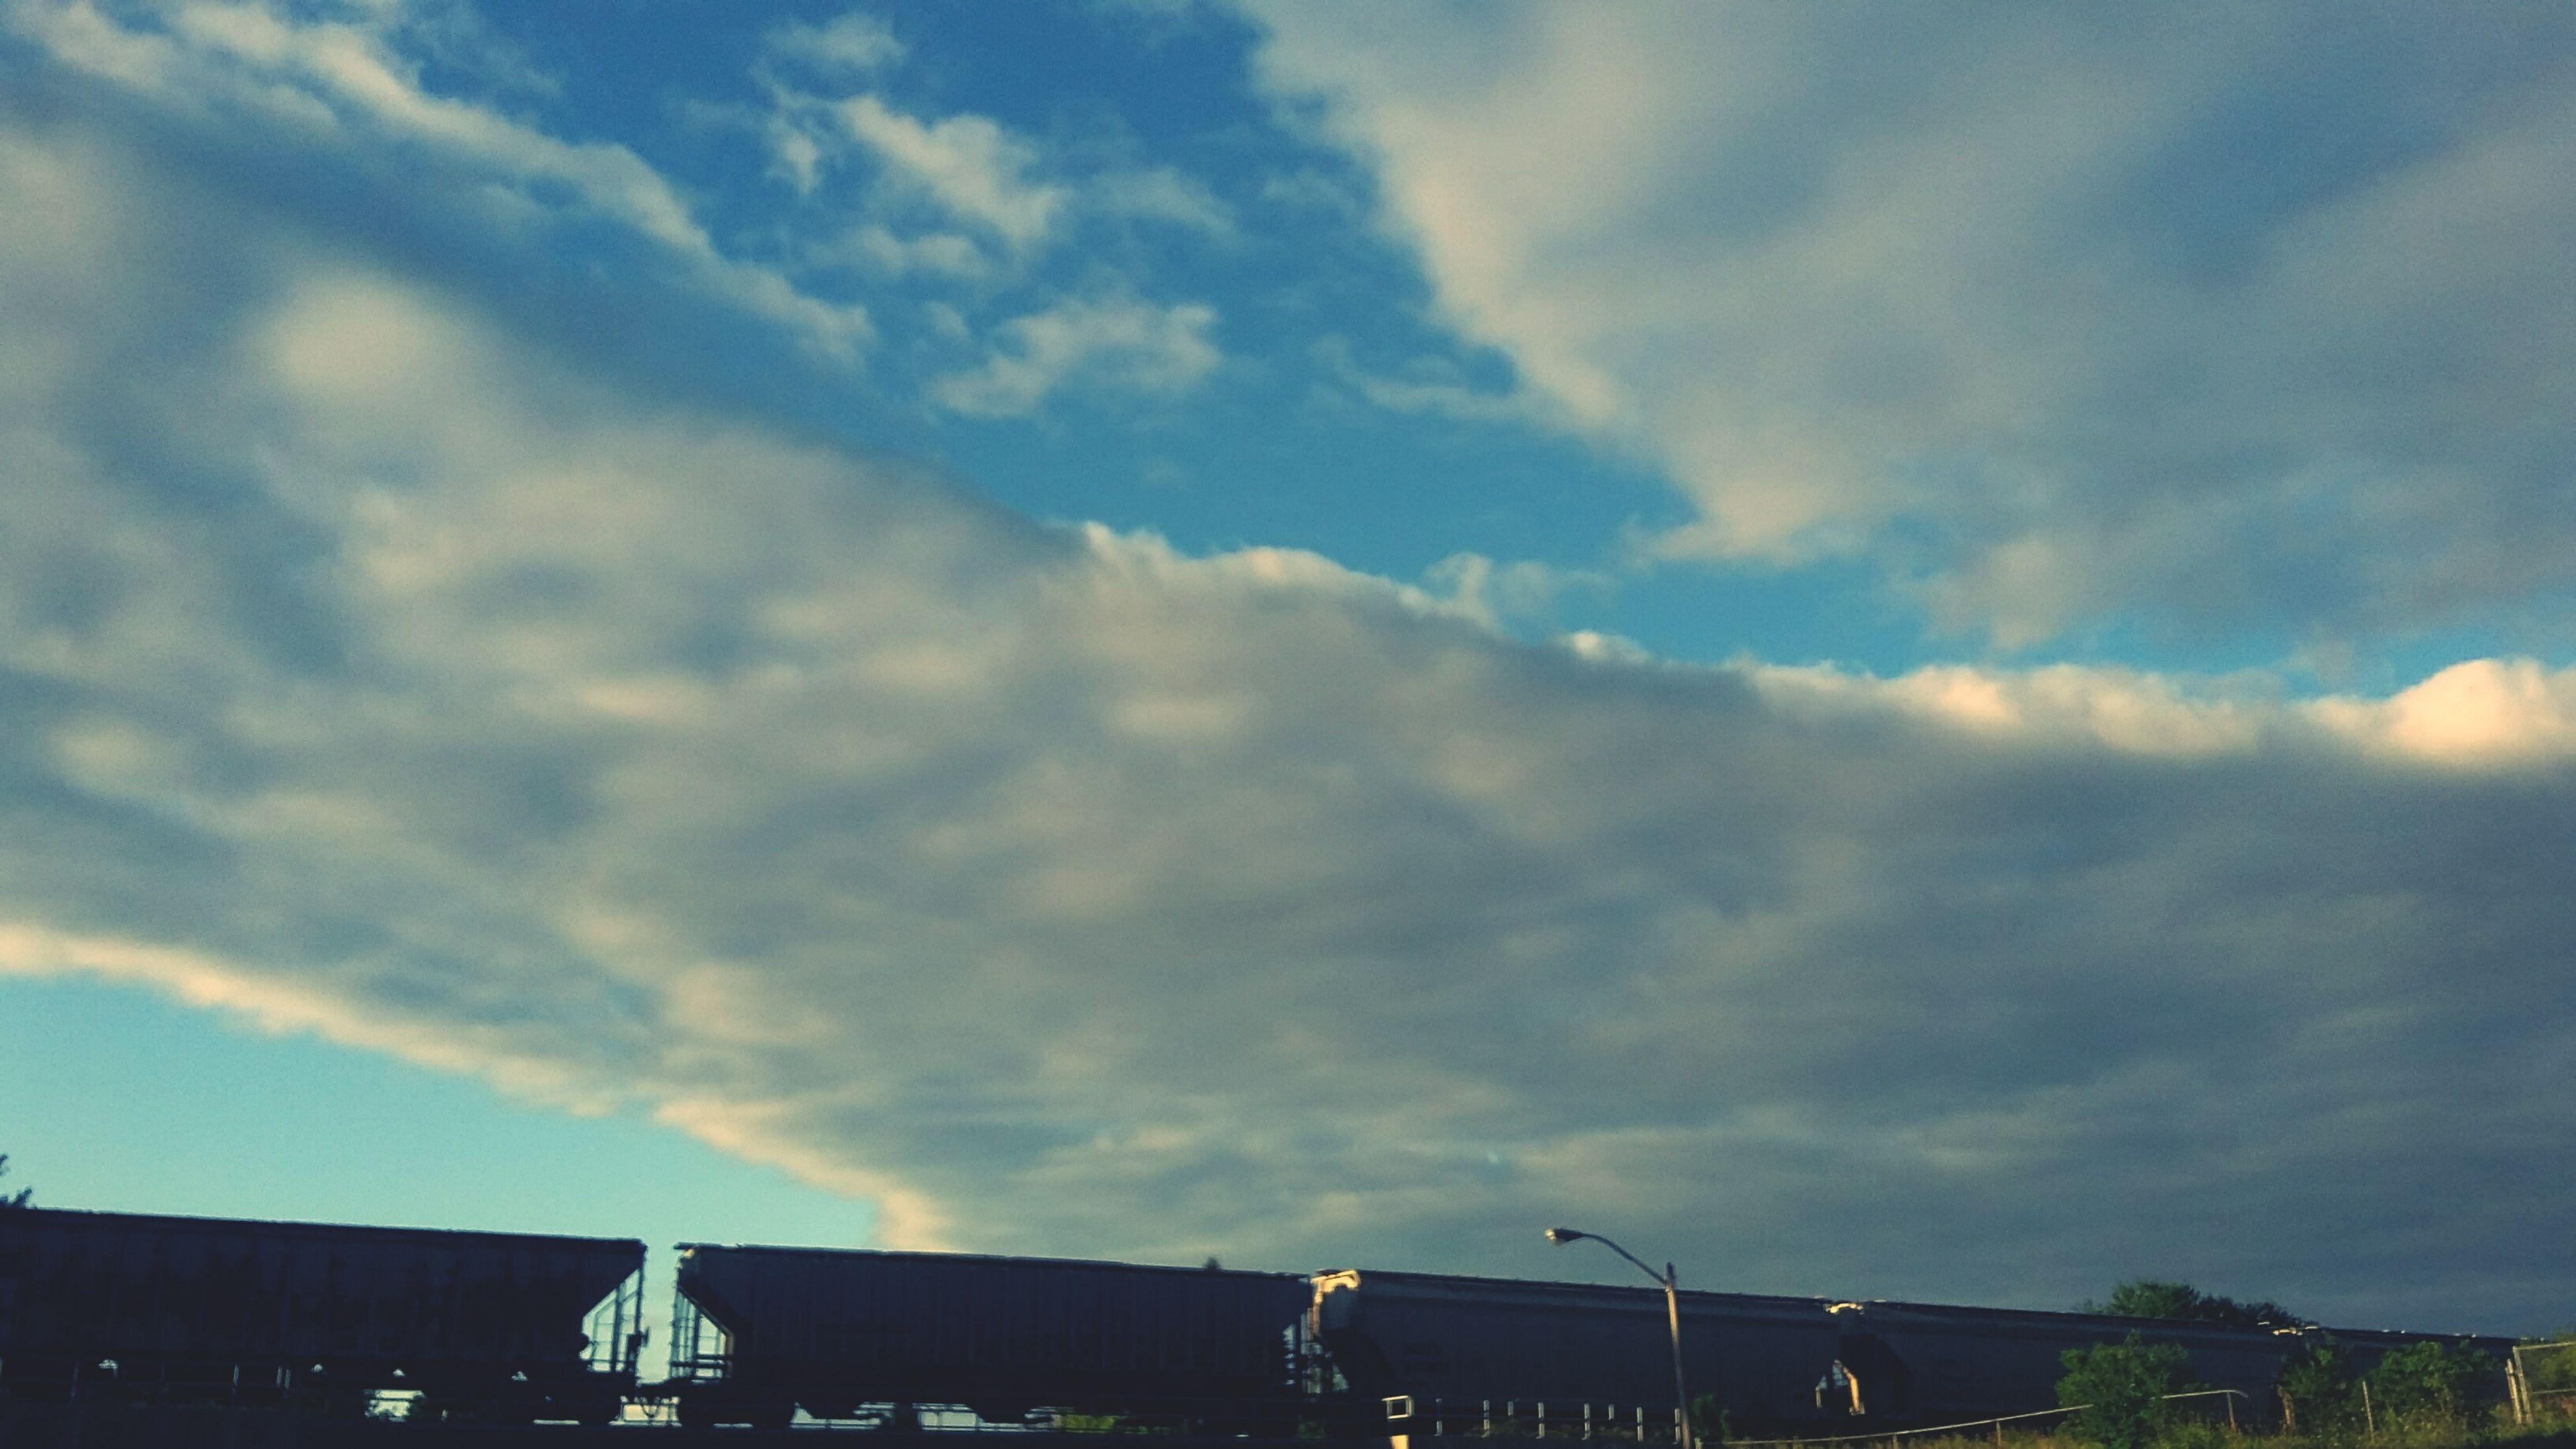 sky, building exterior, cloud - sky, architecture, built structure, cloudy, low angle view, cloud, weather, building, sunset, overcast, city, house, residential structure, residential building, silhouette, nature, outdoors, dusk